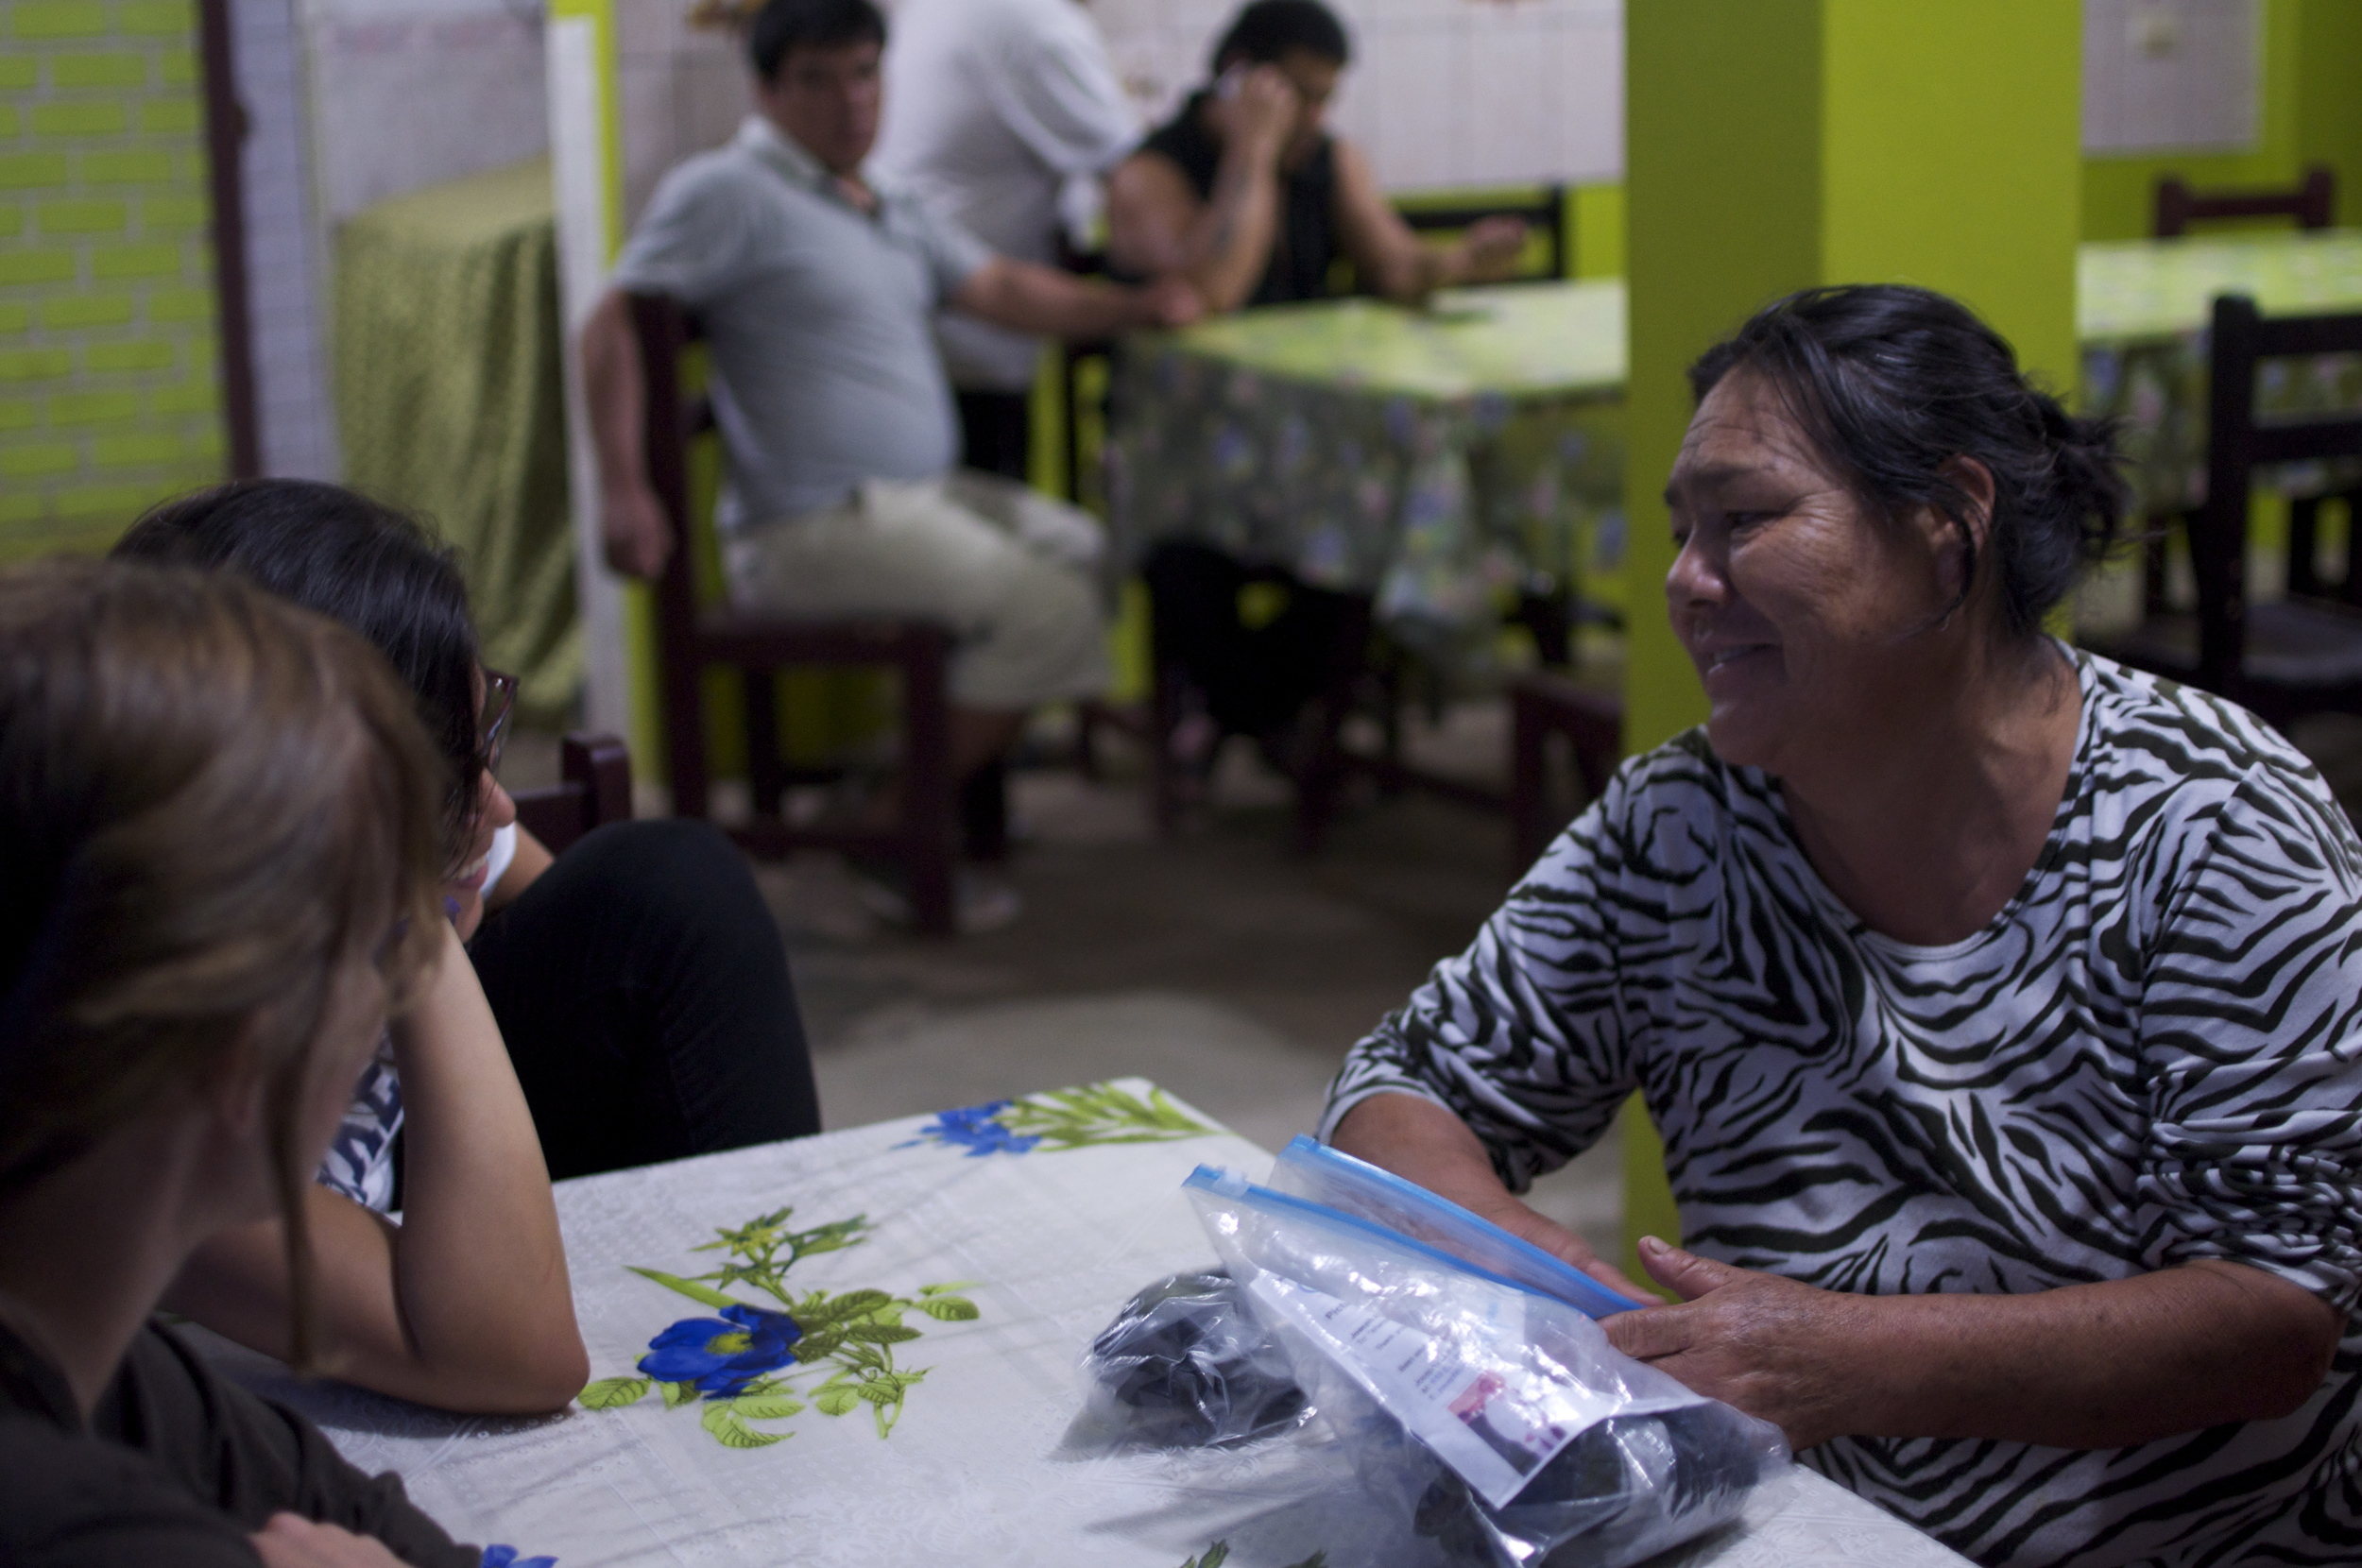 June 2014 - Julia Calder ó n de Avila chatting with her patients before a healing ceremony.